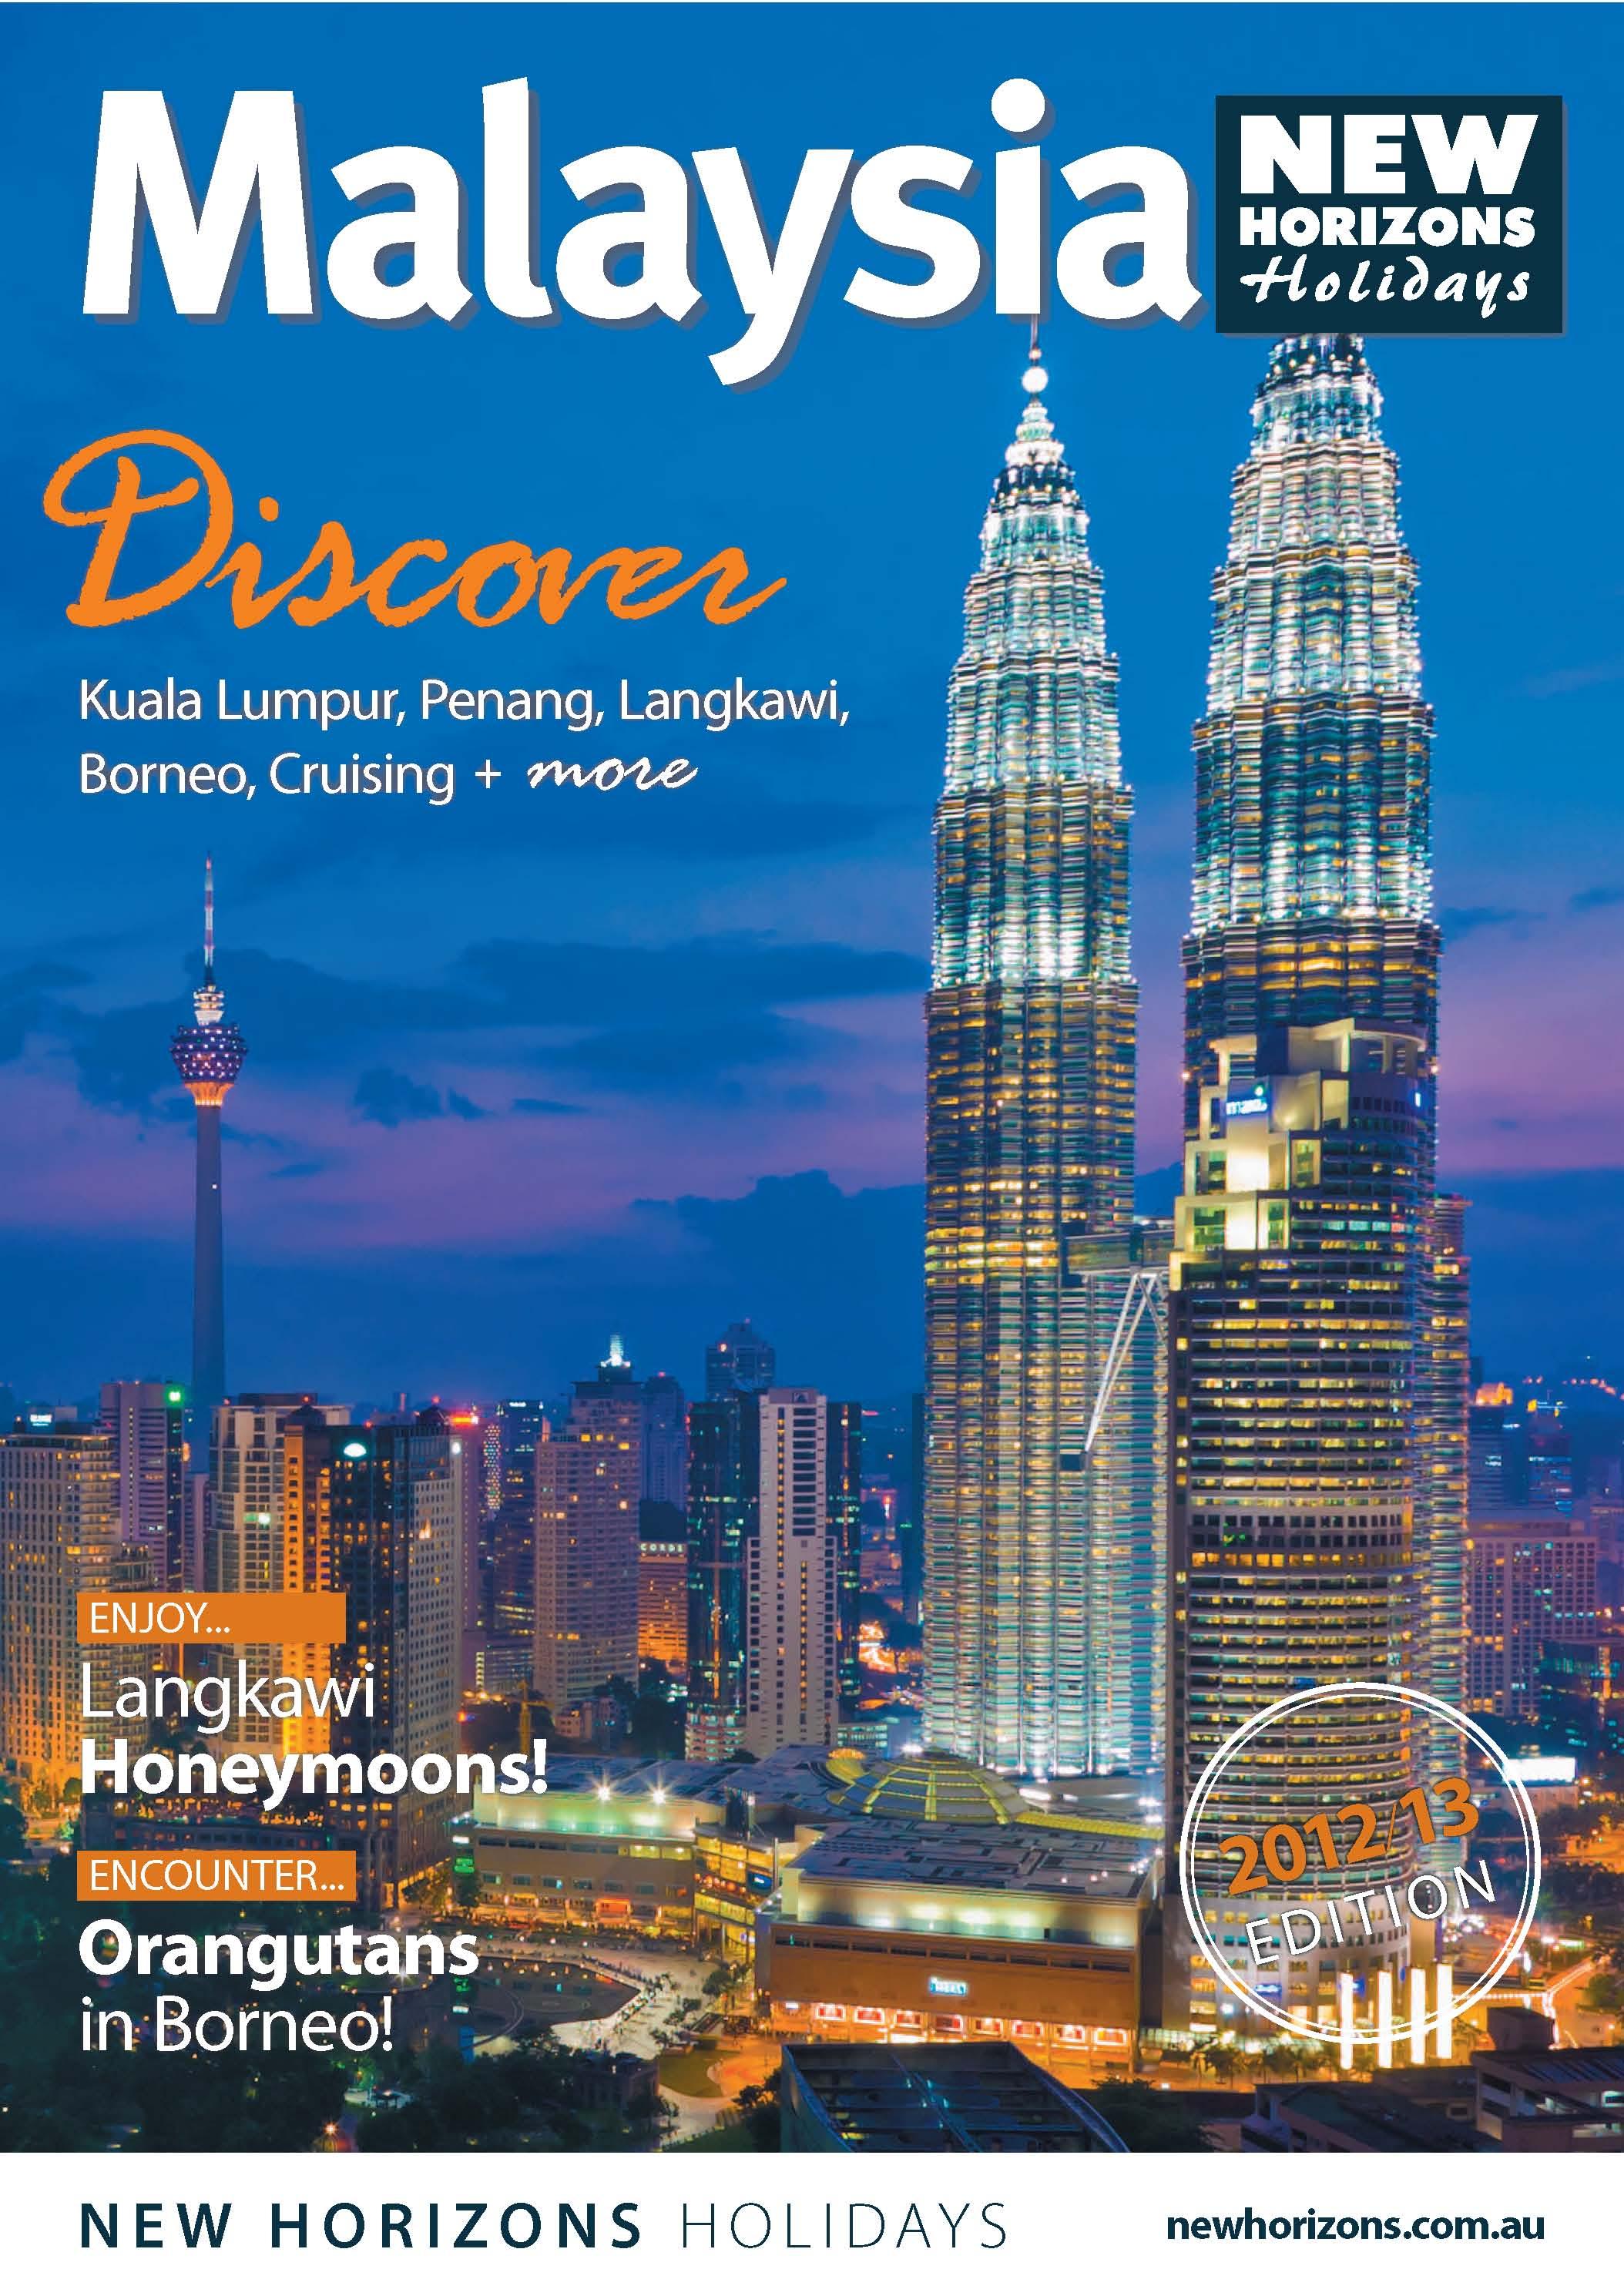 New Horizons Tour And Travel